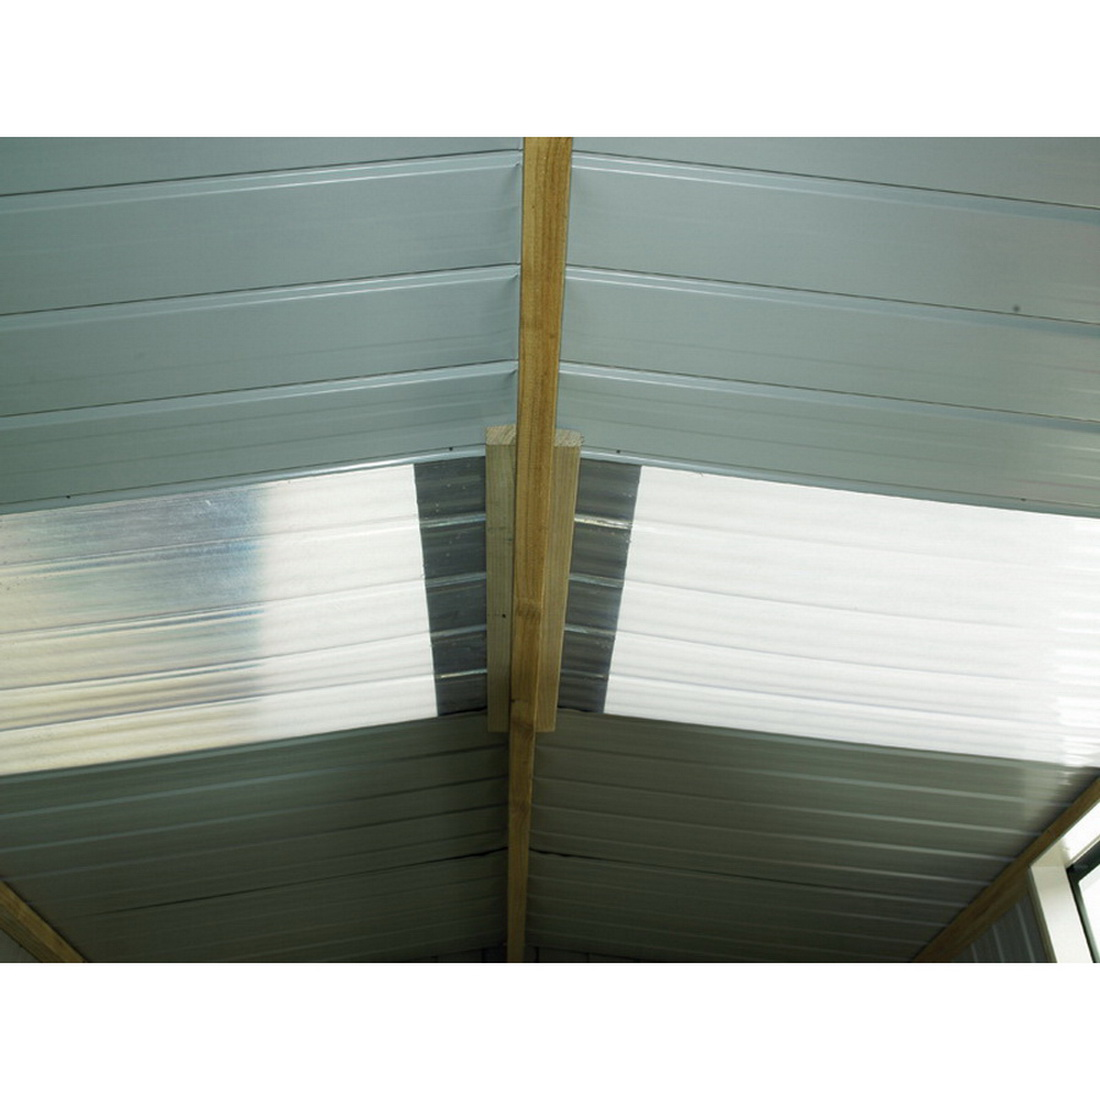 Kiwi Double Side Standard Clear Roof Panel